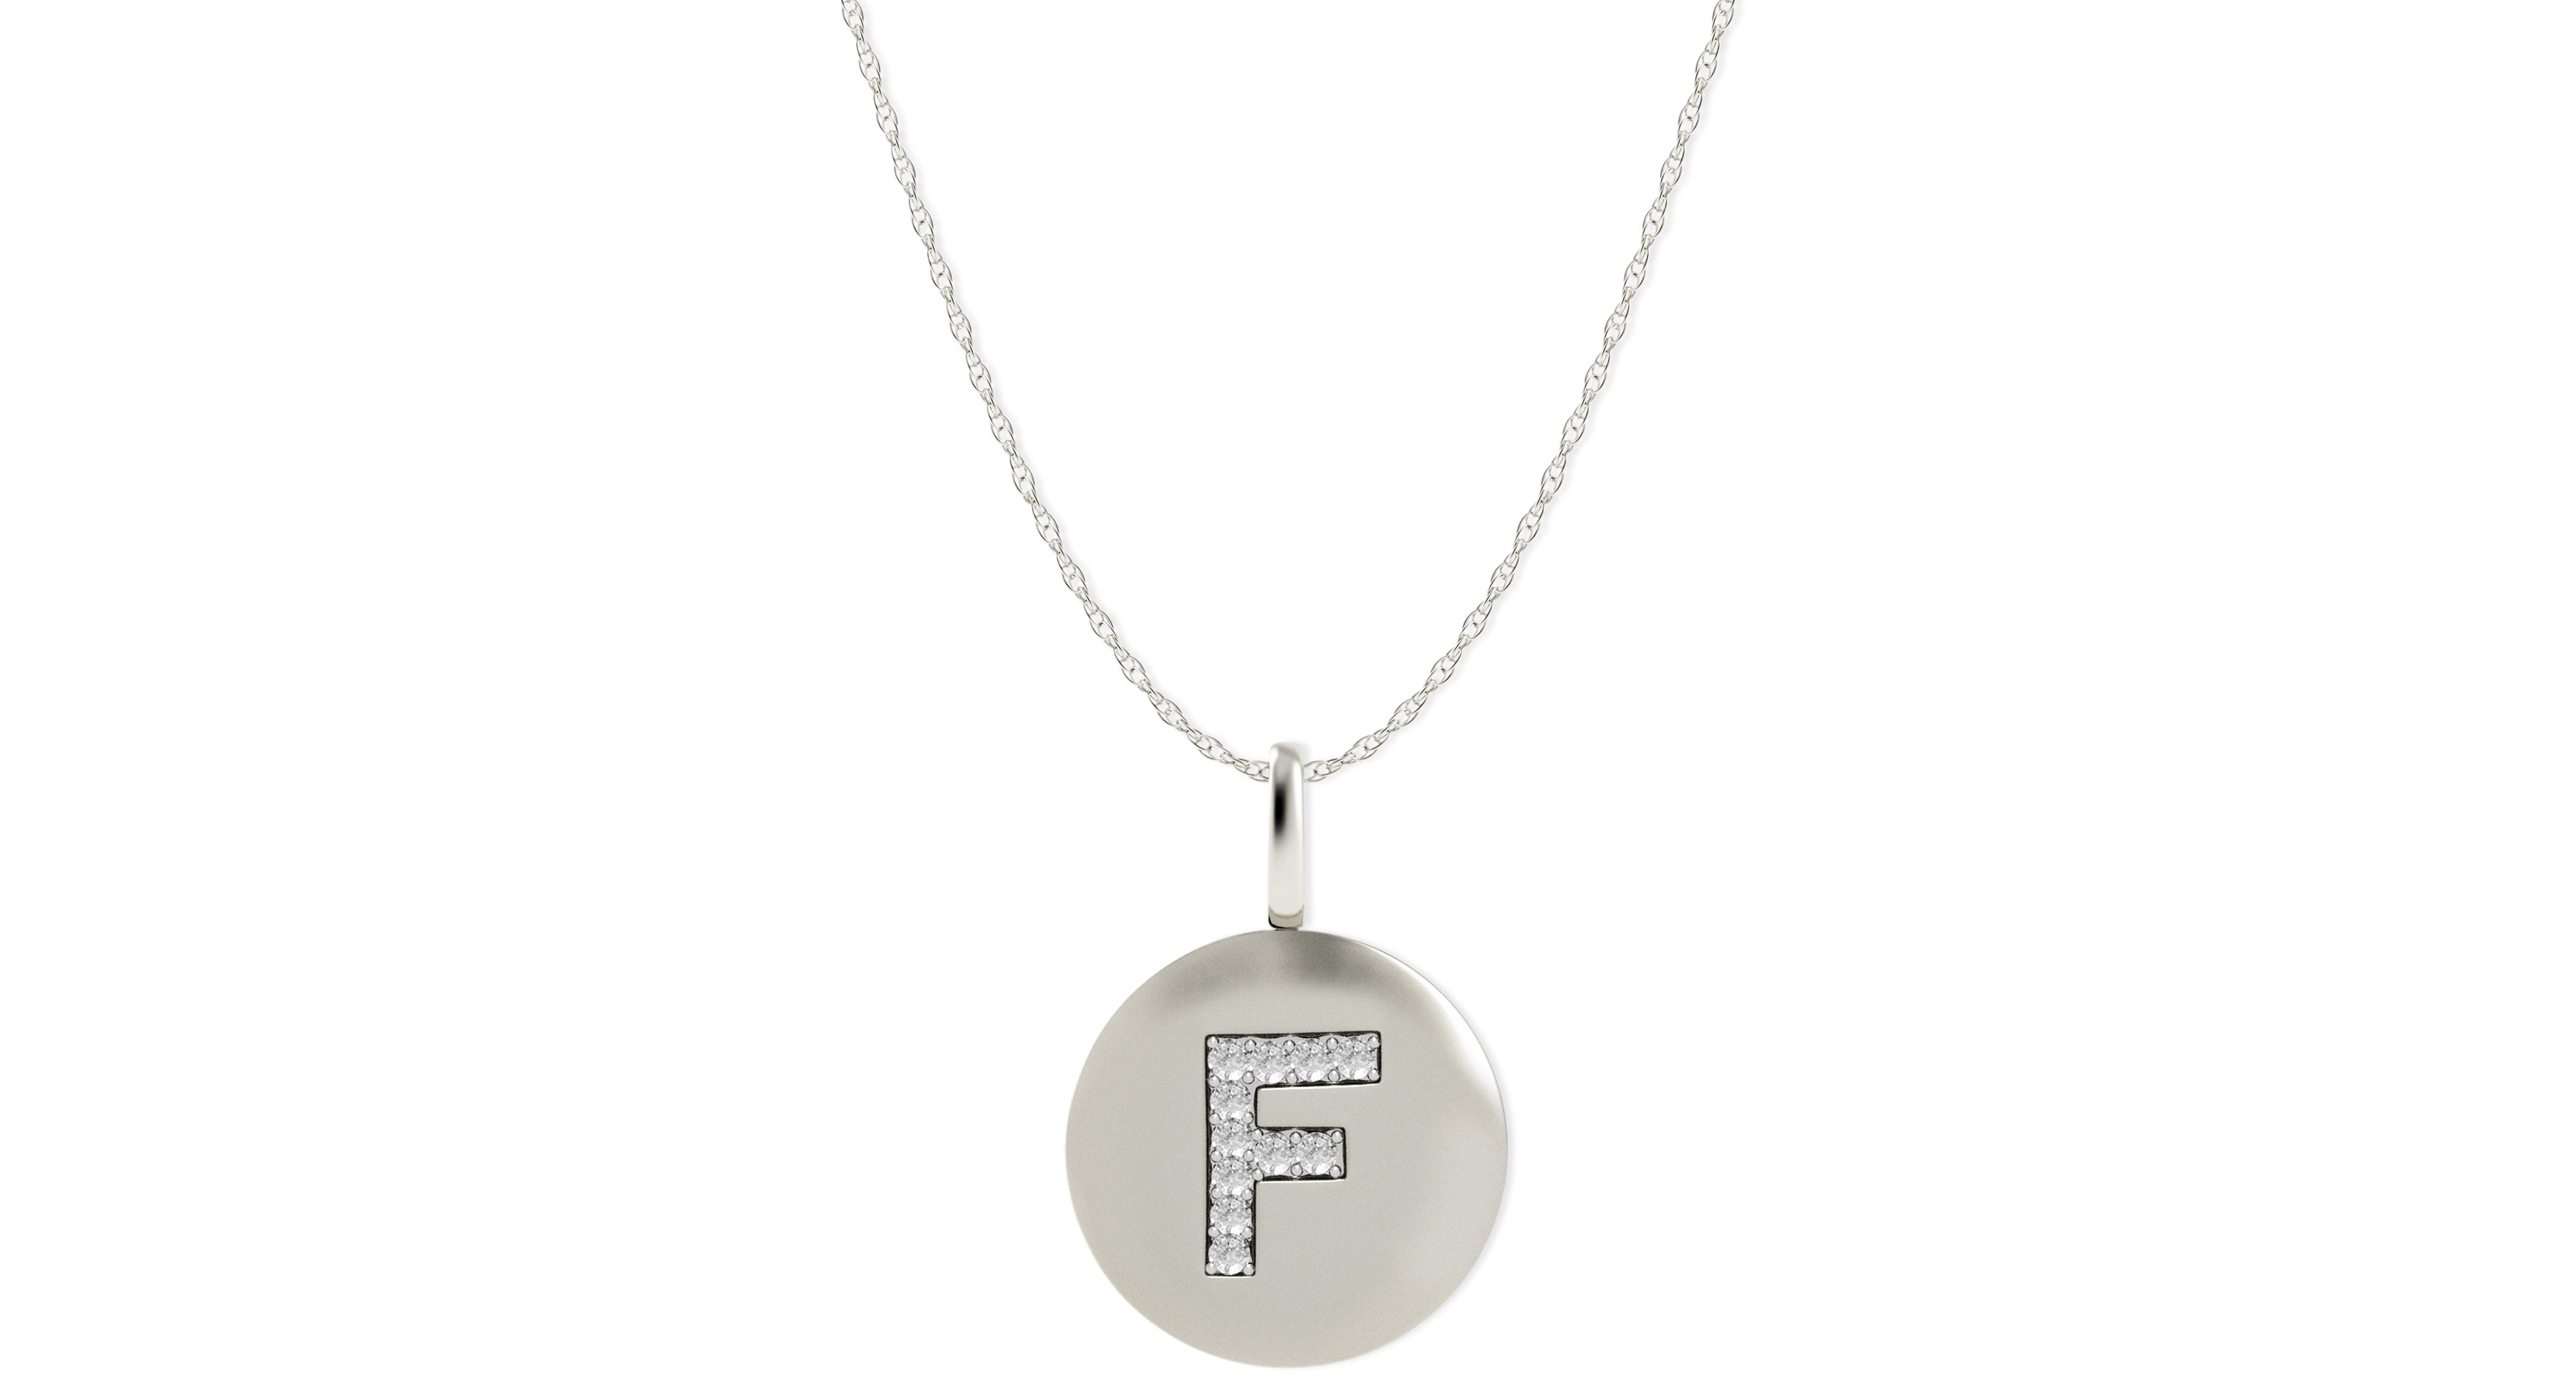 14k White Gold Necklace, Diamond Letter F Disk Pendant (1/10 ct. t.w.)